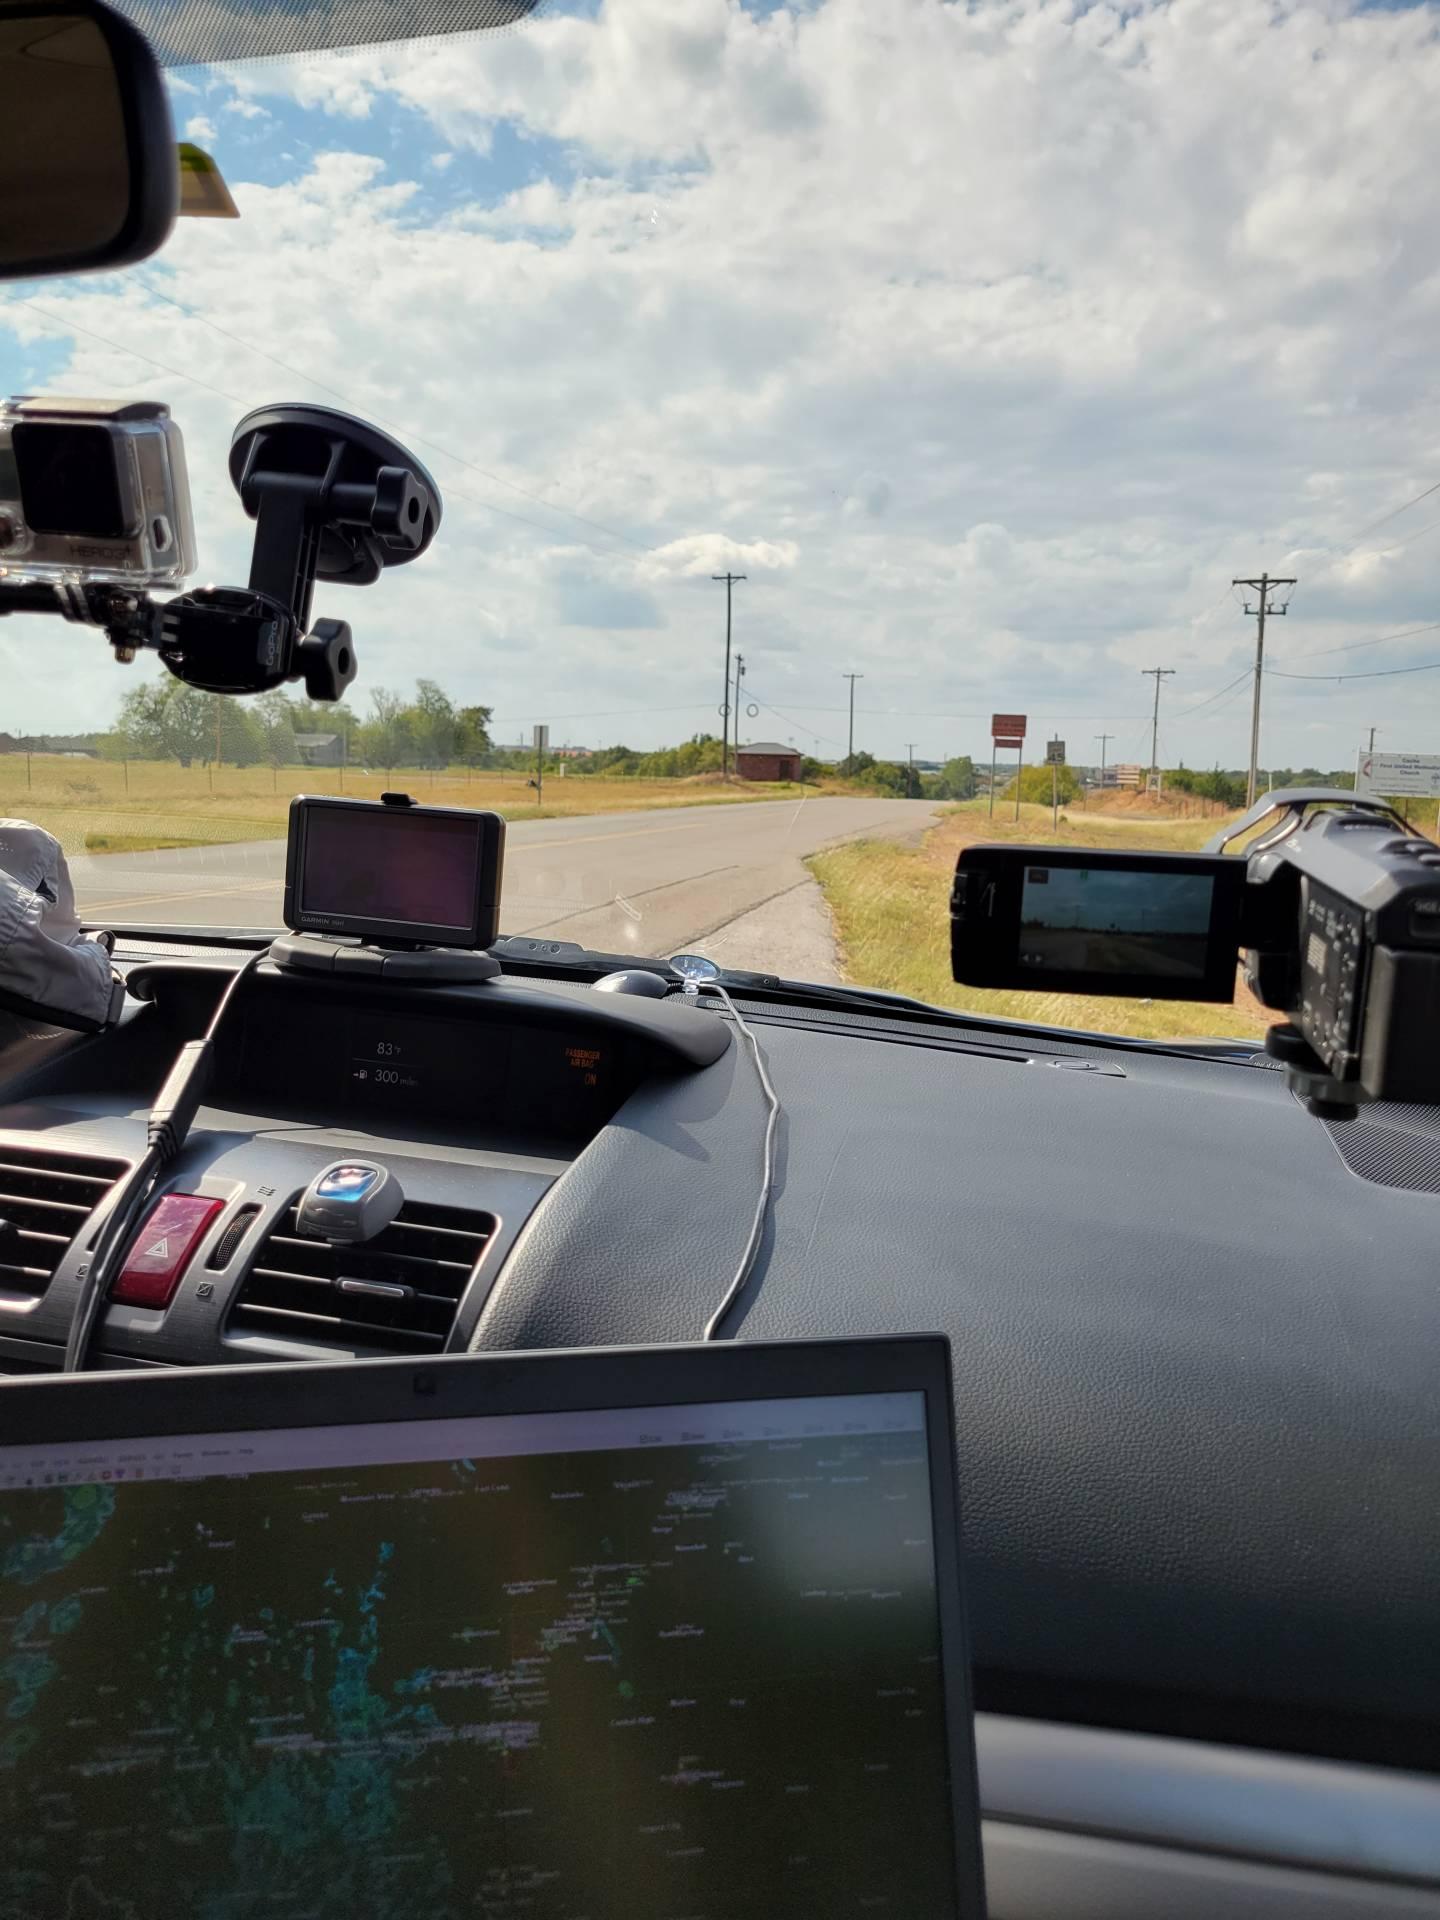 Monitoring for storm development near Cache, Oklahoma #okwx